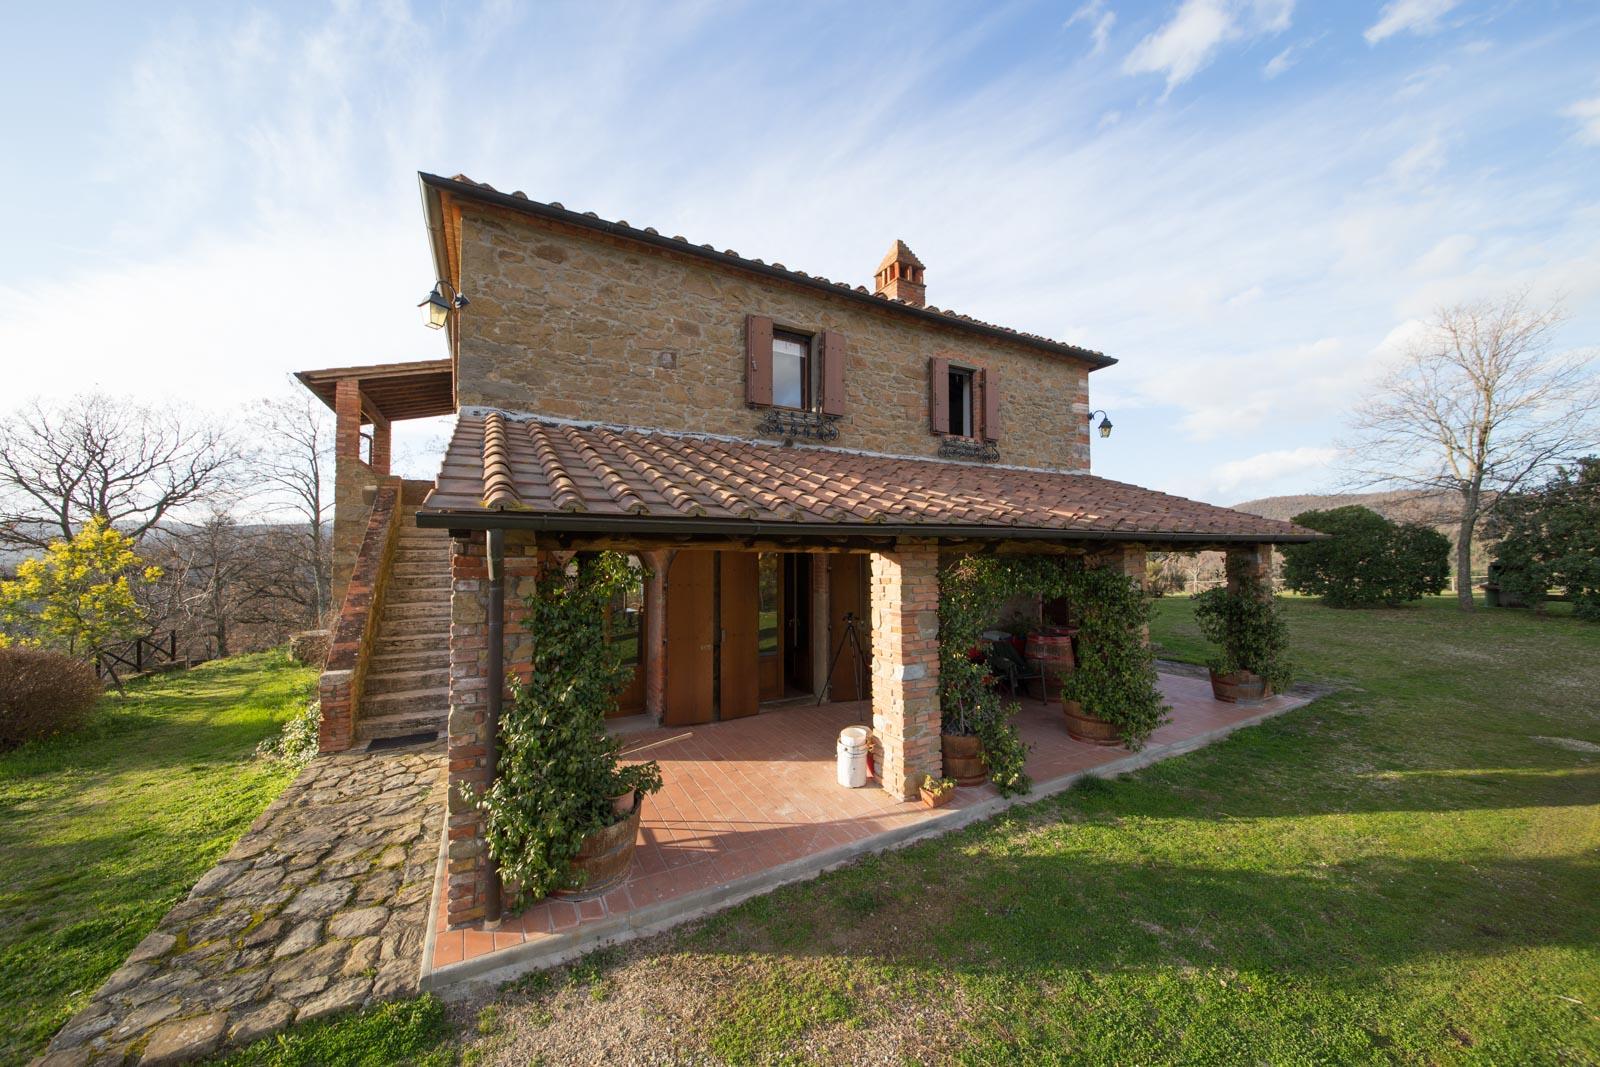 Landhaus kaufen verkaufen in italien toskana arezzo for Piccola casa con avvolgente portico